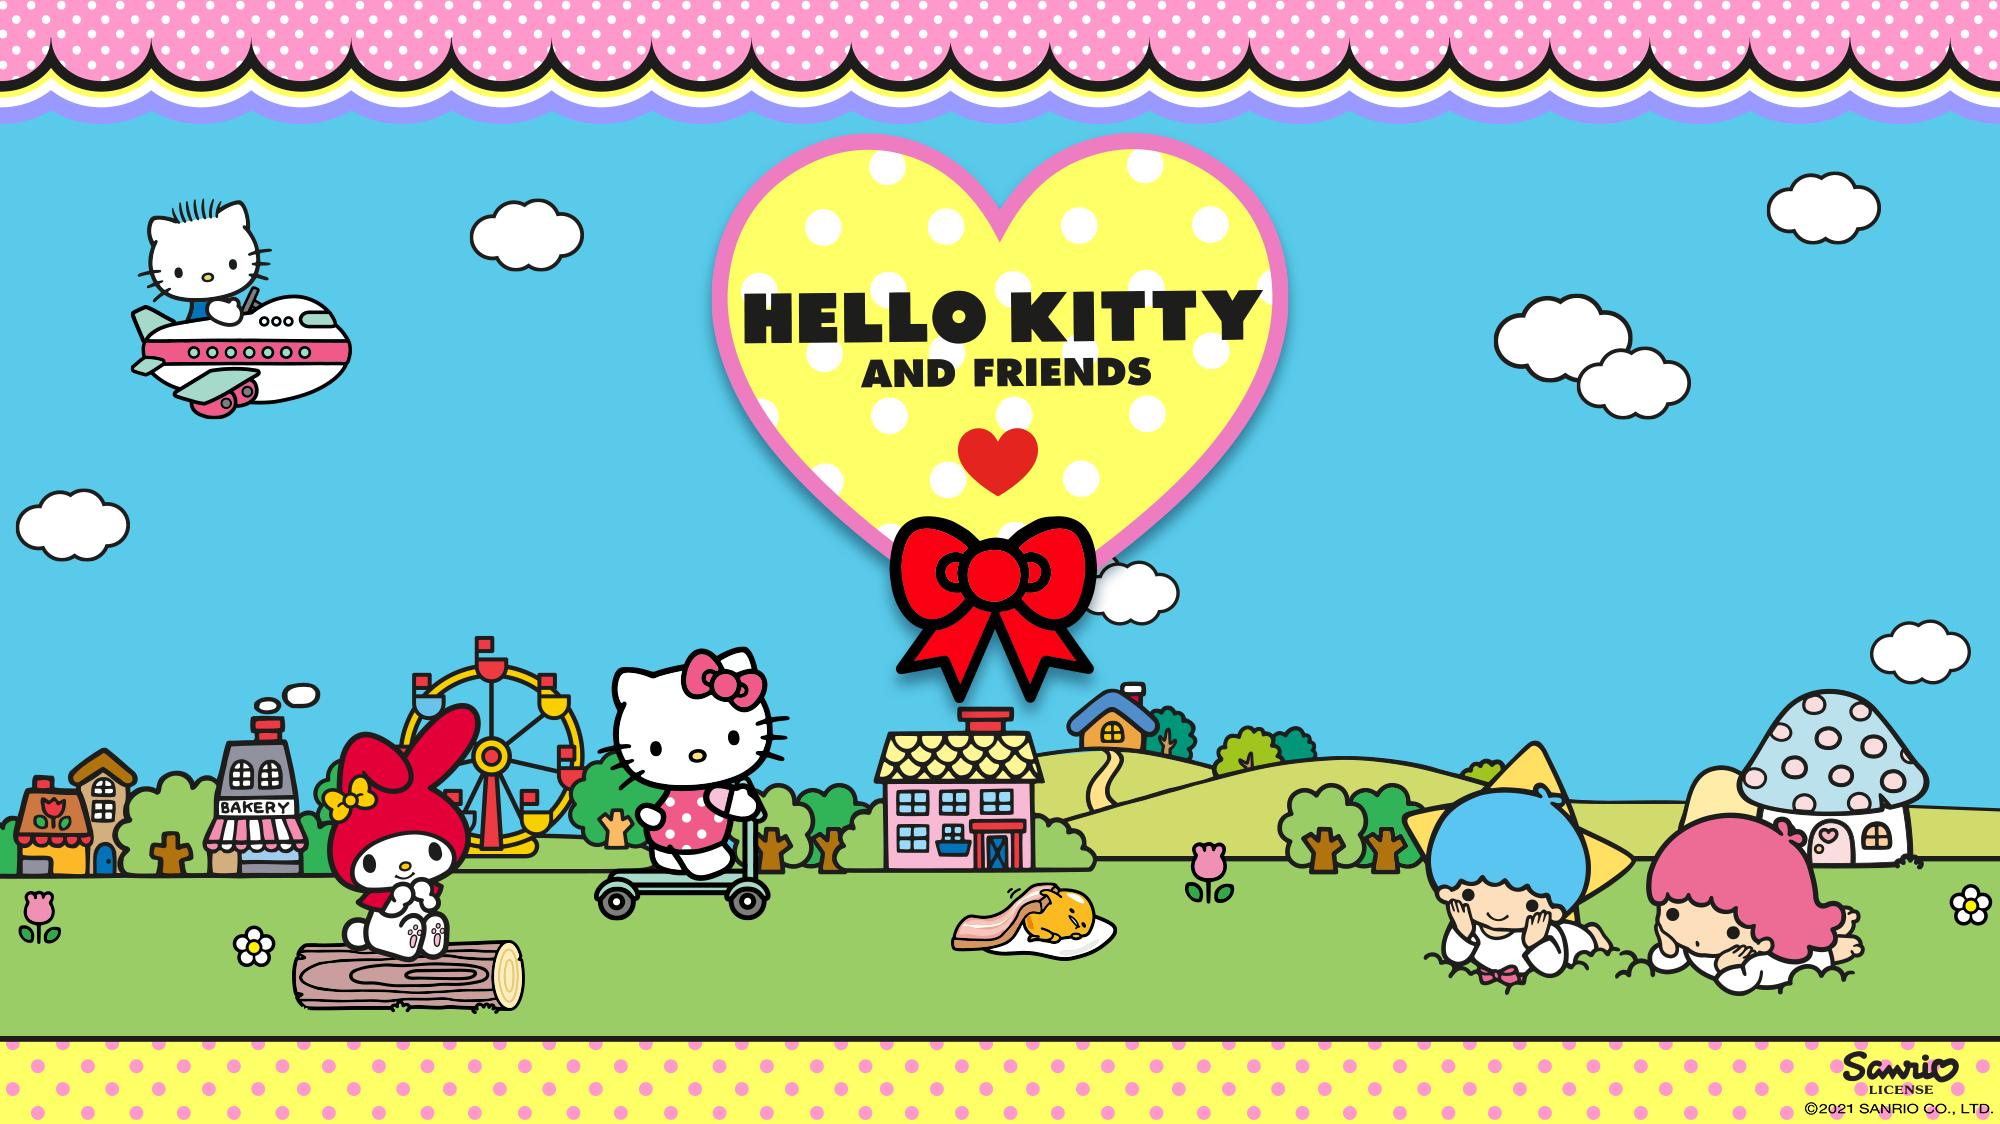 https://www.irregularchoicemexico.com/categoria/hello-kitty